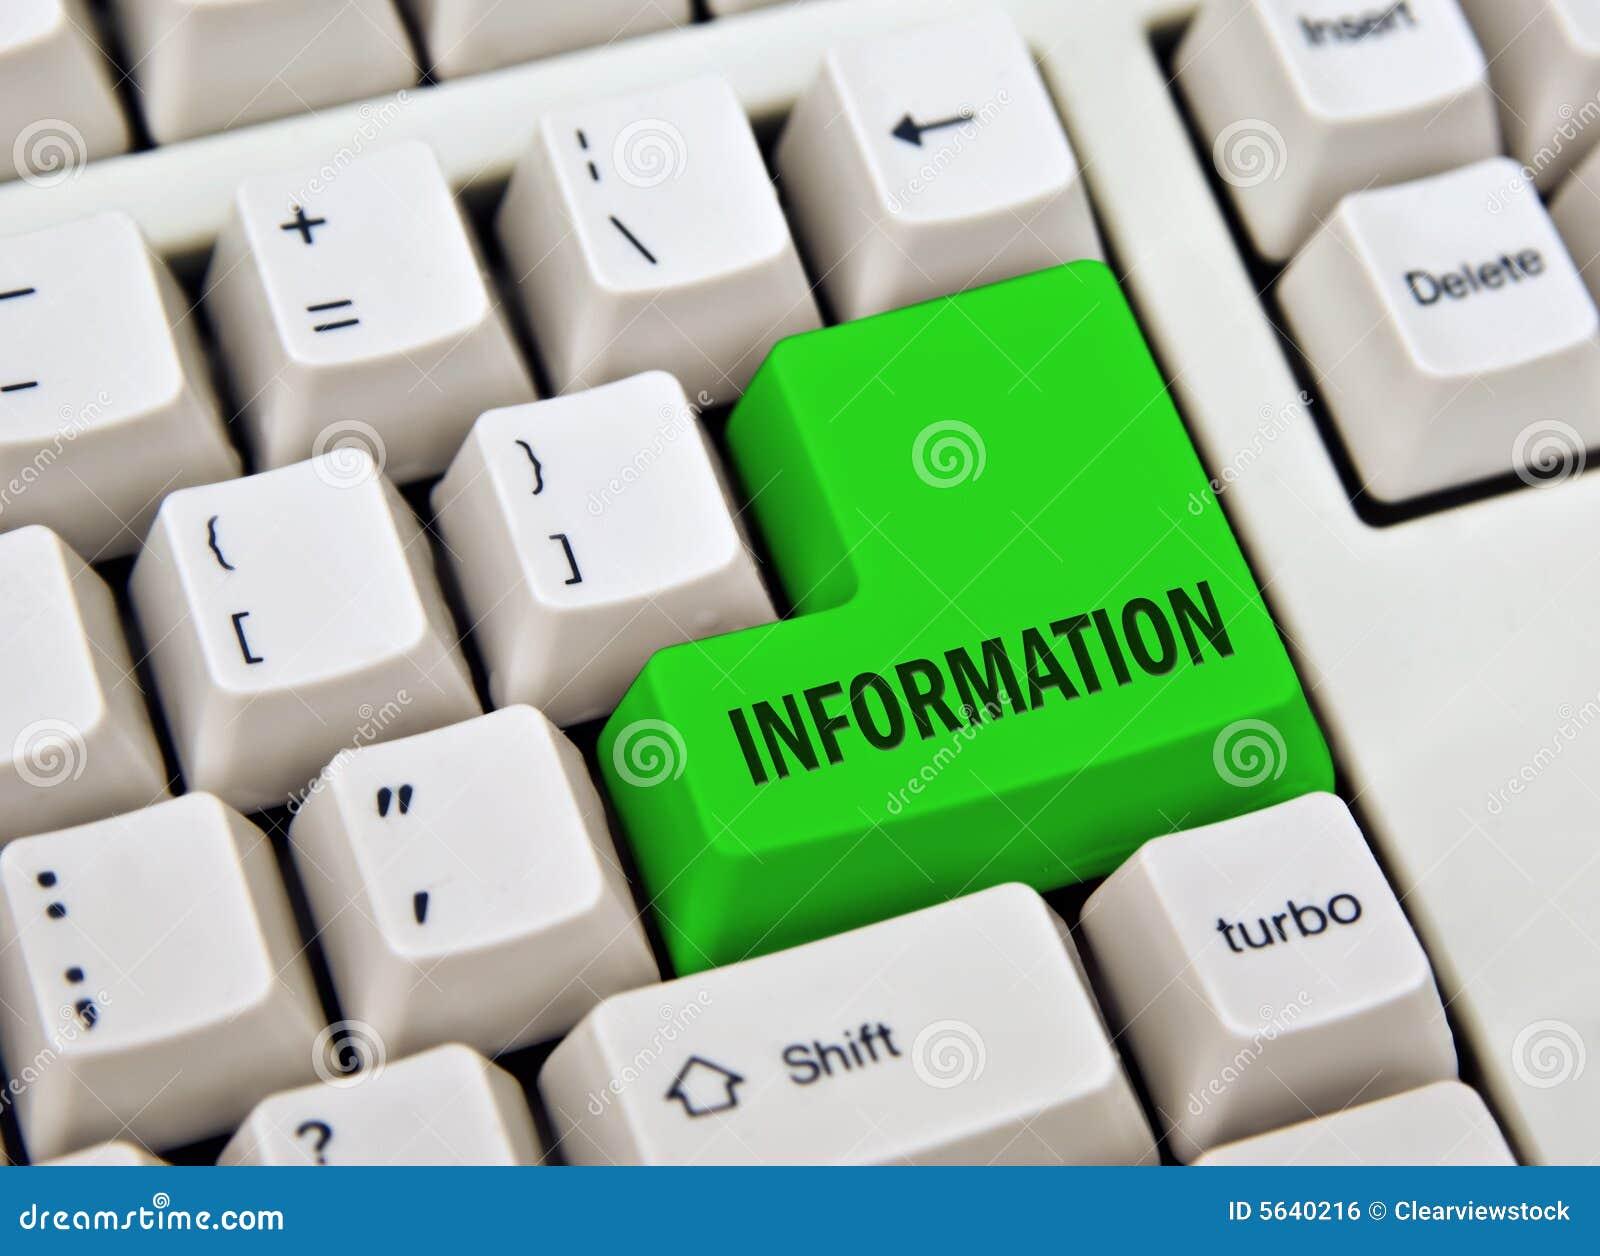 computer keyboard information - DriverLayer Search Engine  |Computer Keyboard Info